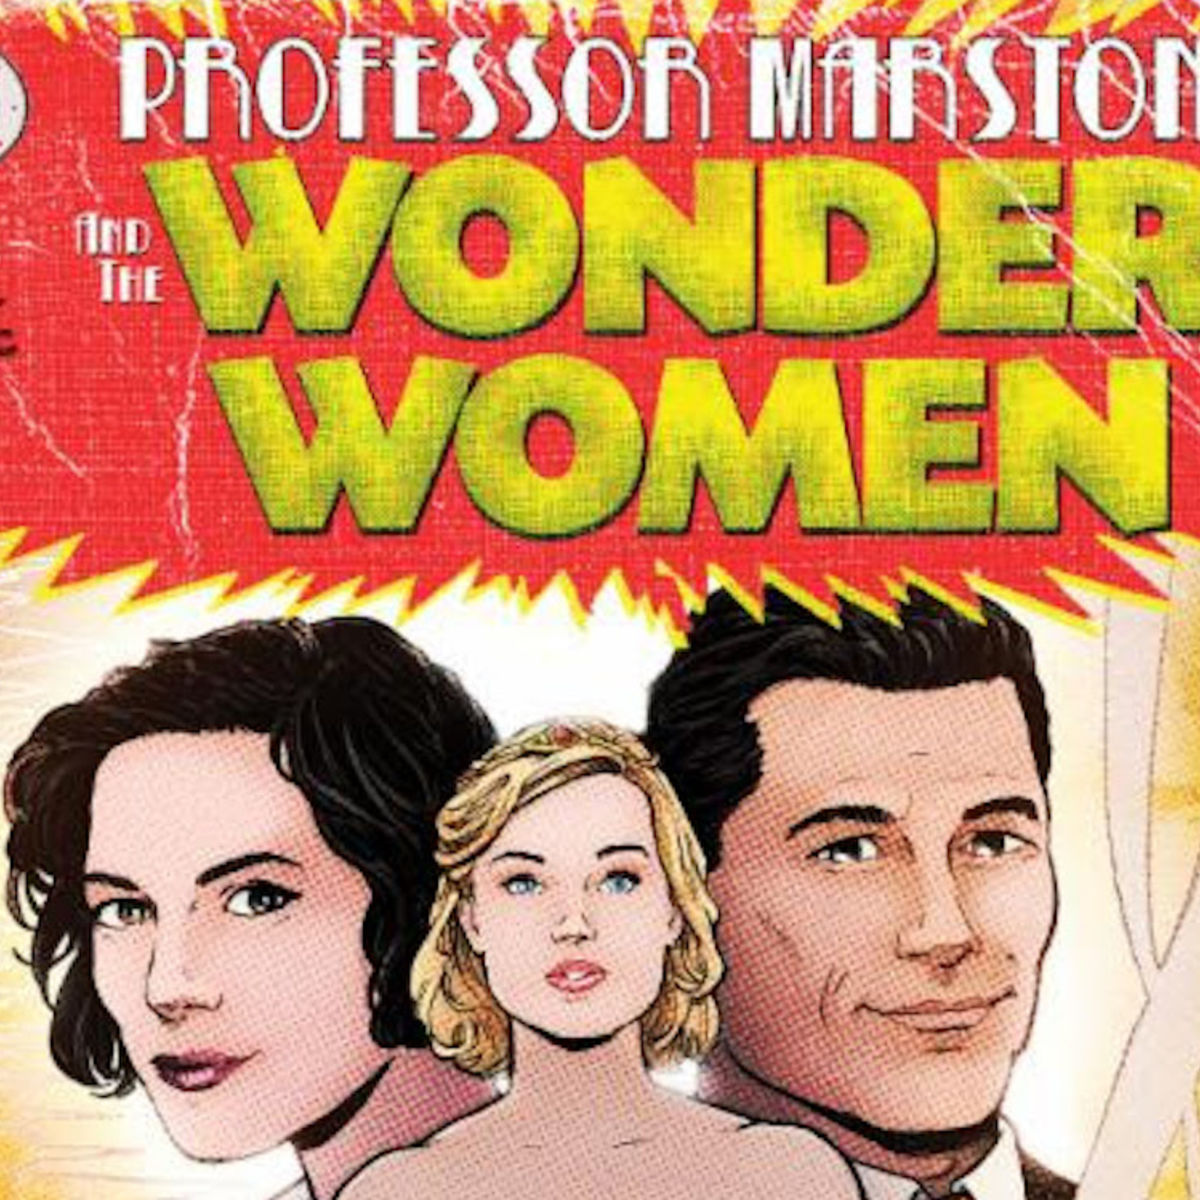 marston_wonder_women_edit.jpg